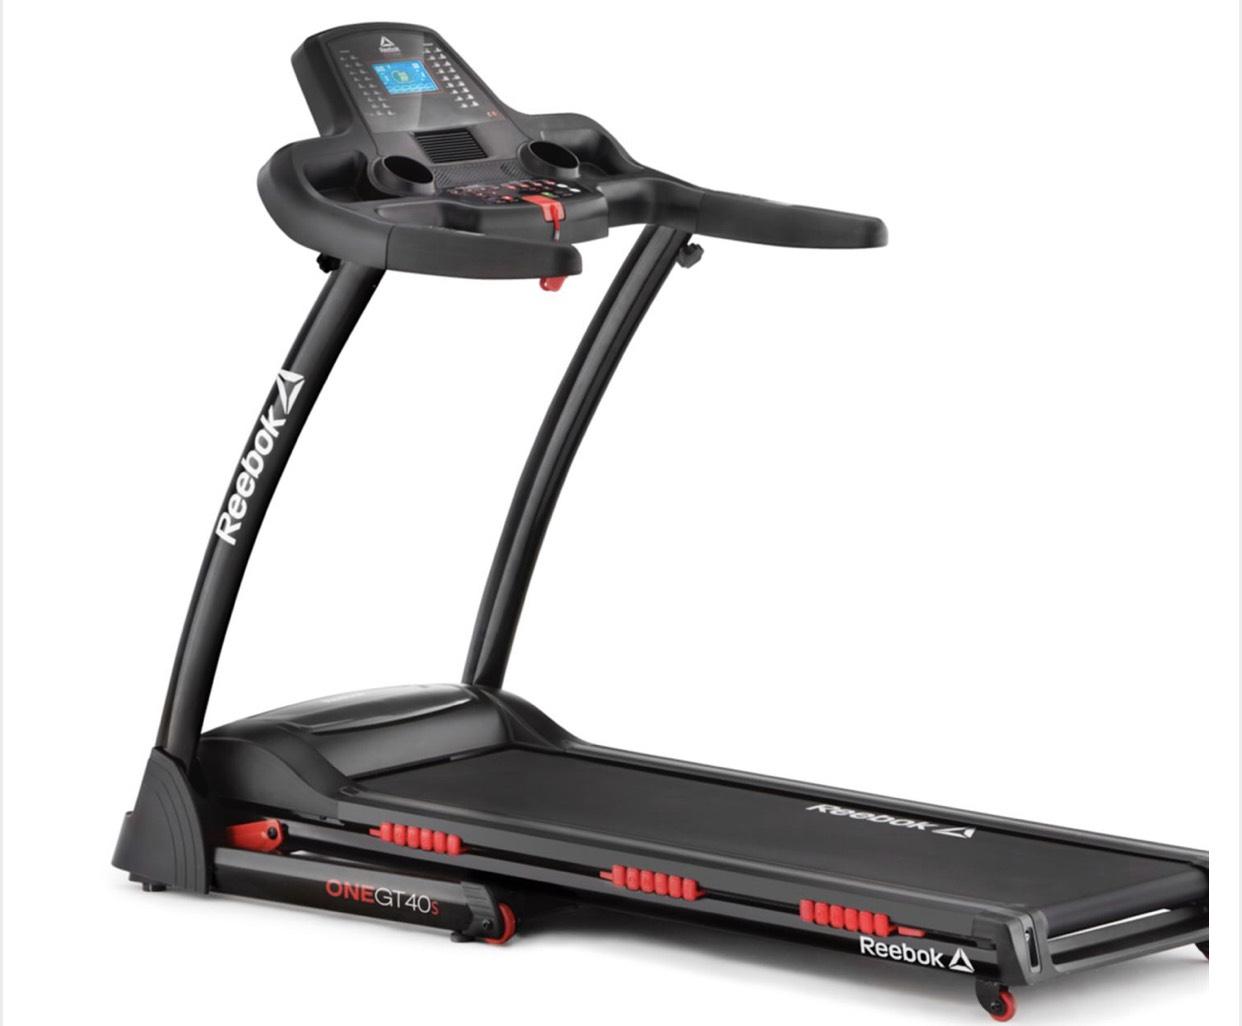 Bargain  Reebok GT40 S Treadmill Deal Back - £300 Delivered @ Sports Direct